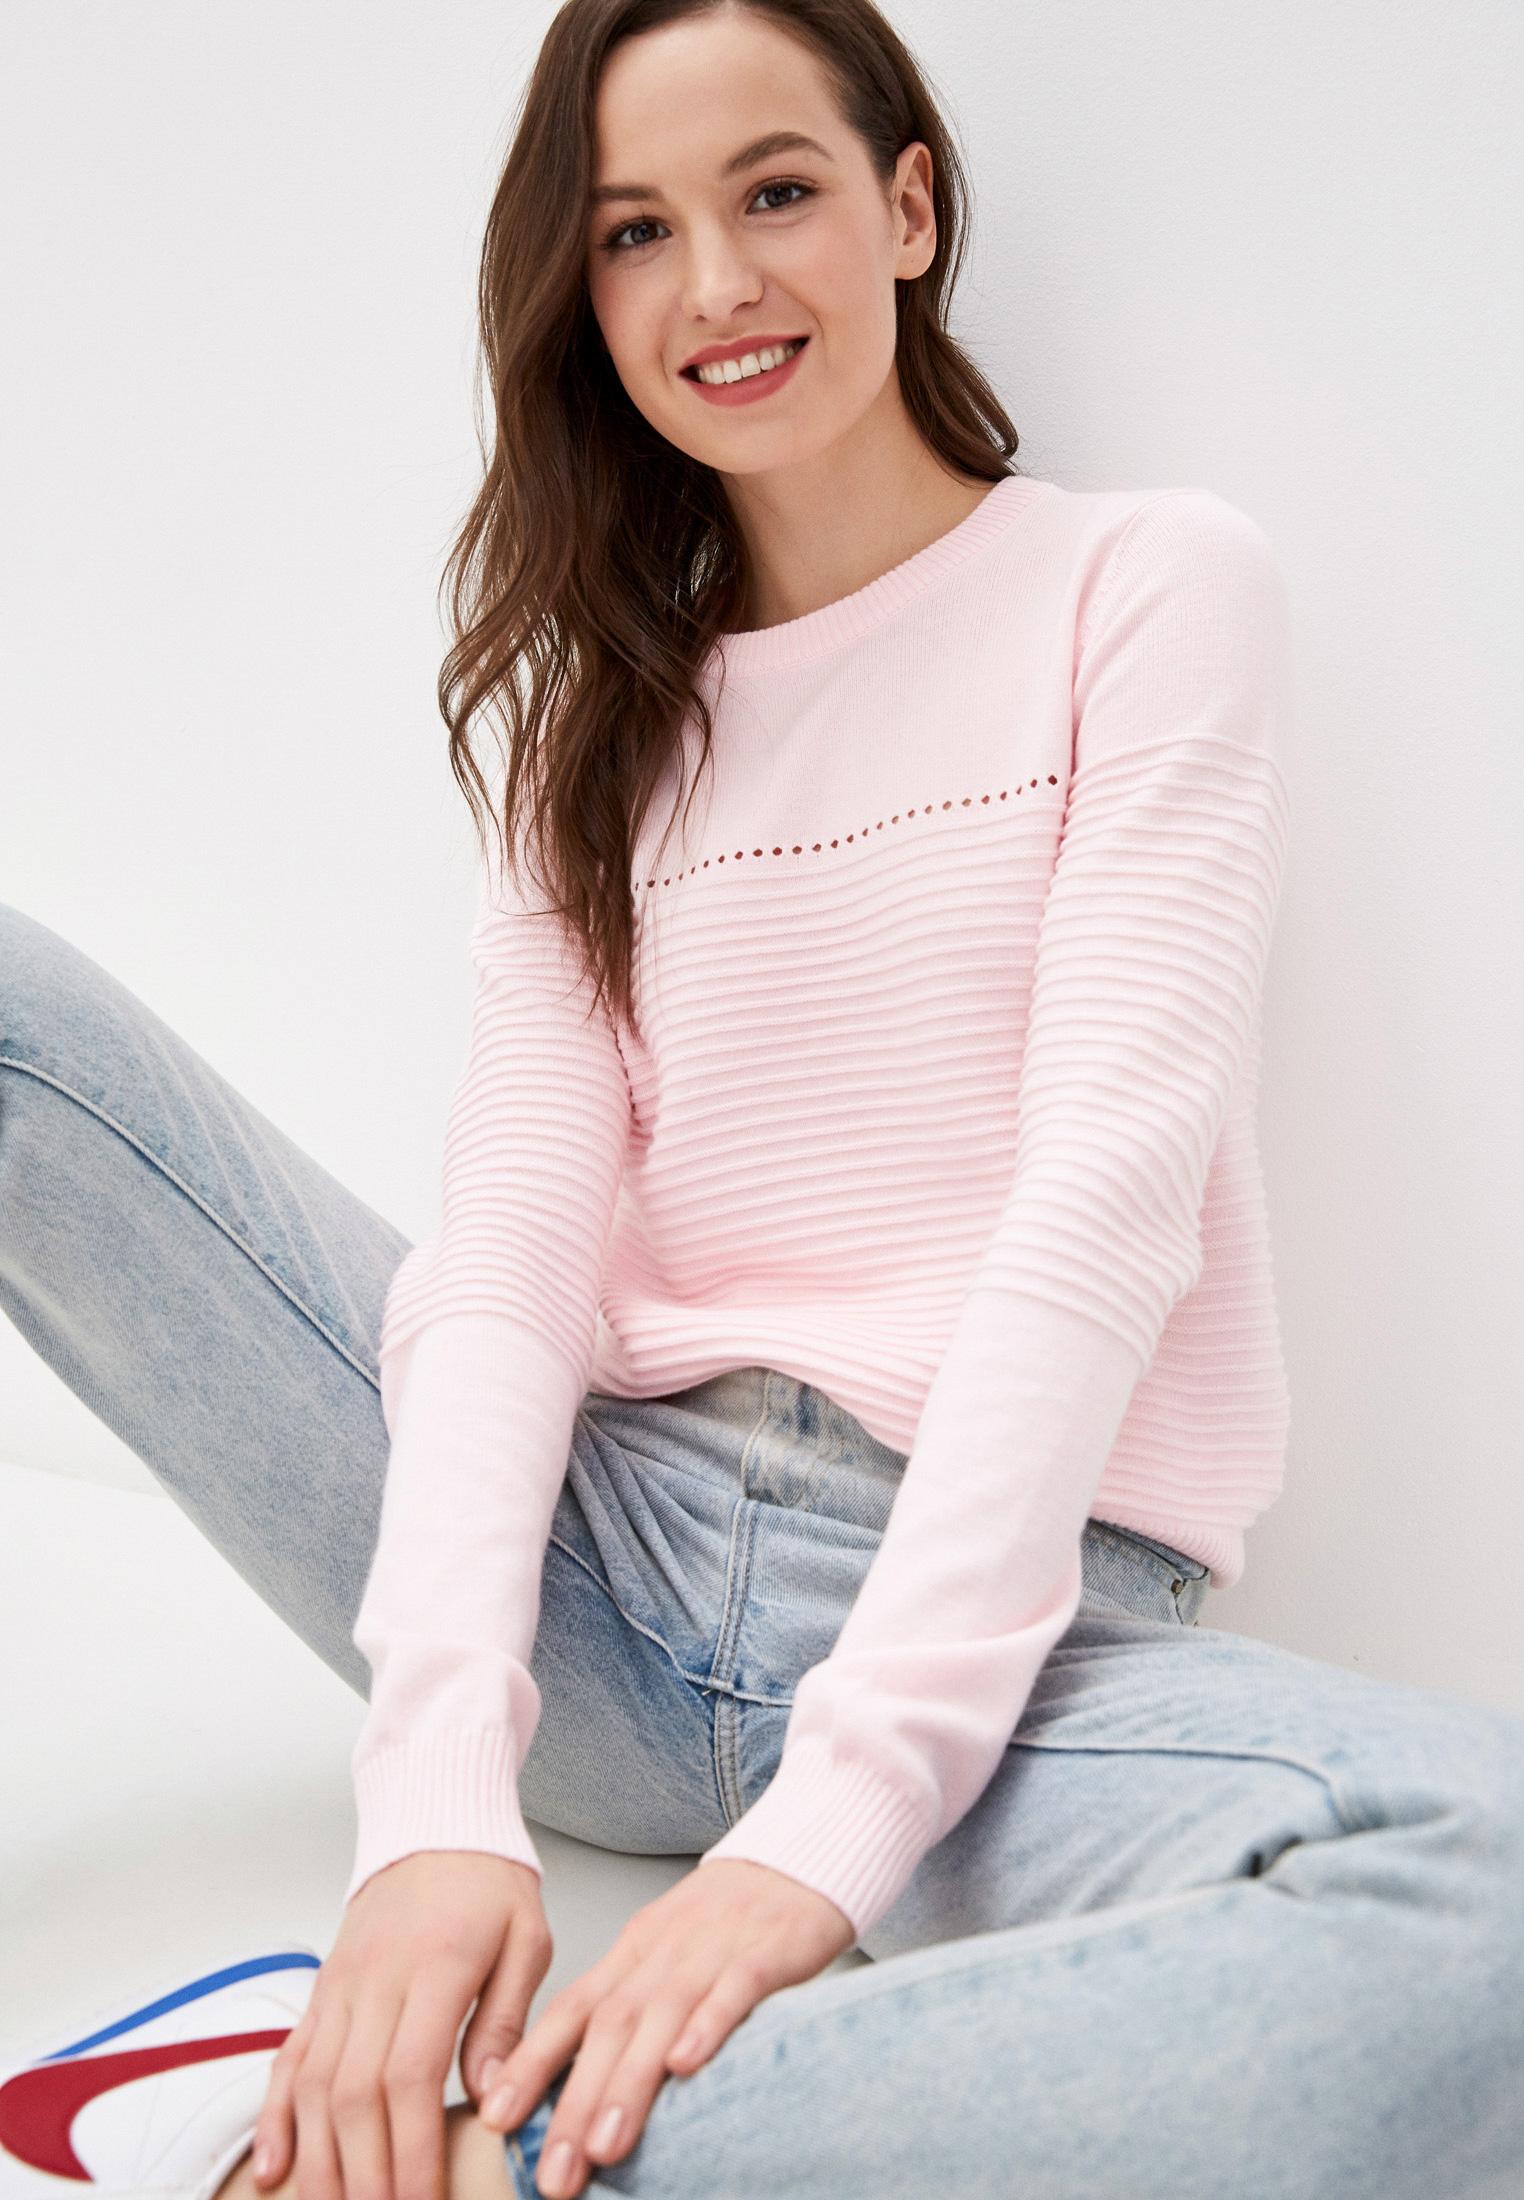 BilliePhillips Teenager Final Fantasy Boy Girl Long Sleeve Tee Shirt